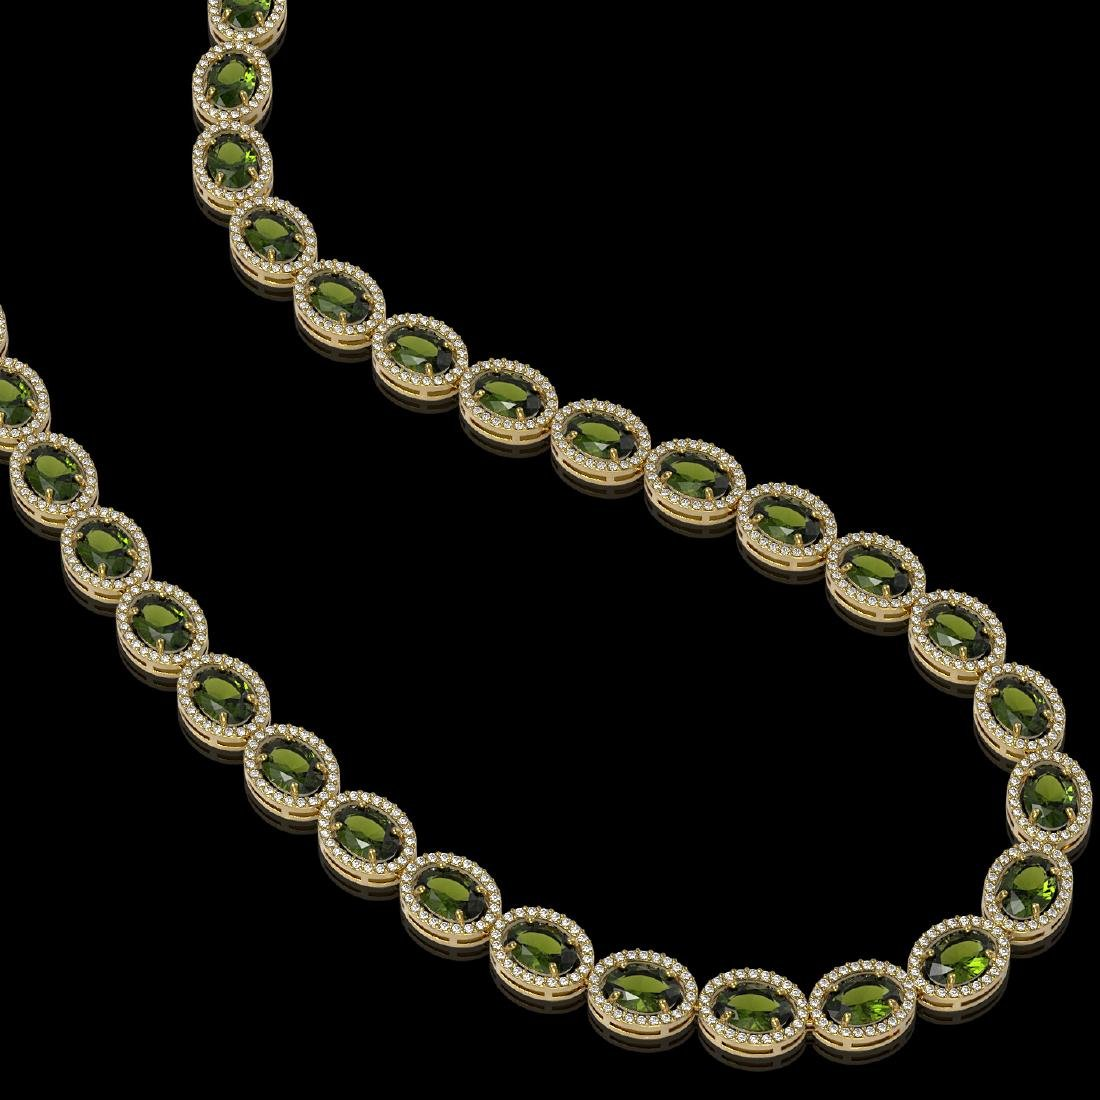 49.46 CTW Tourmaline & Diamond Halo Necklace 10K Yellow - 2